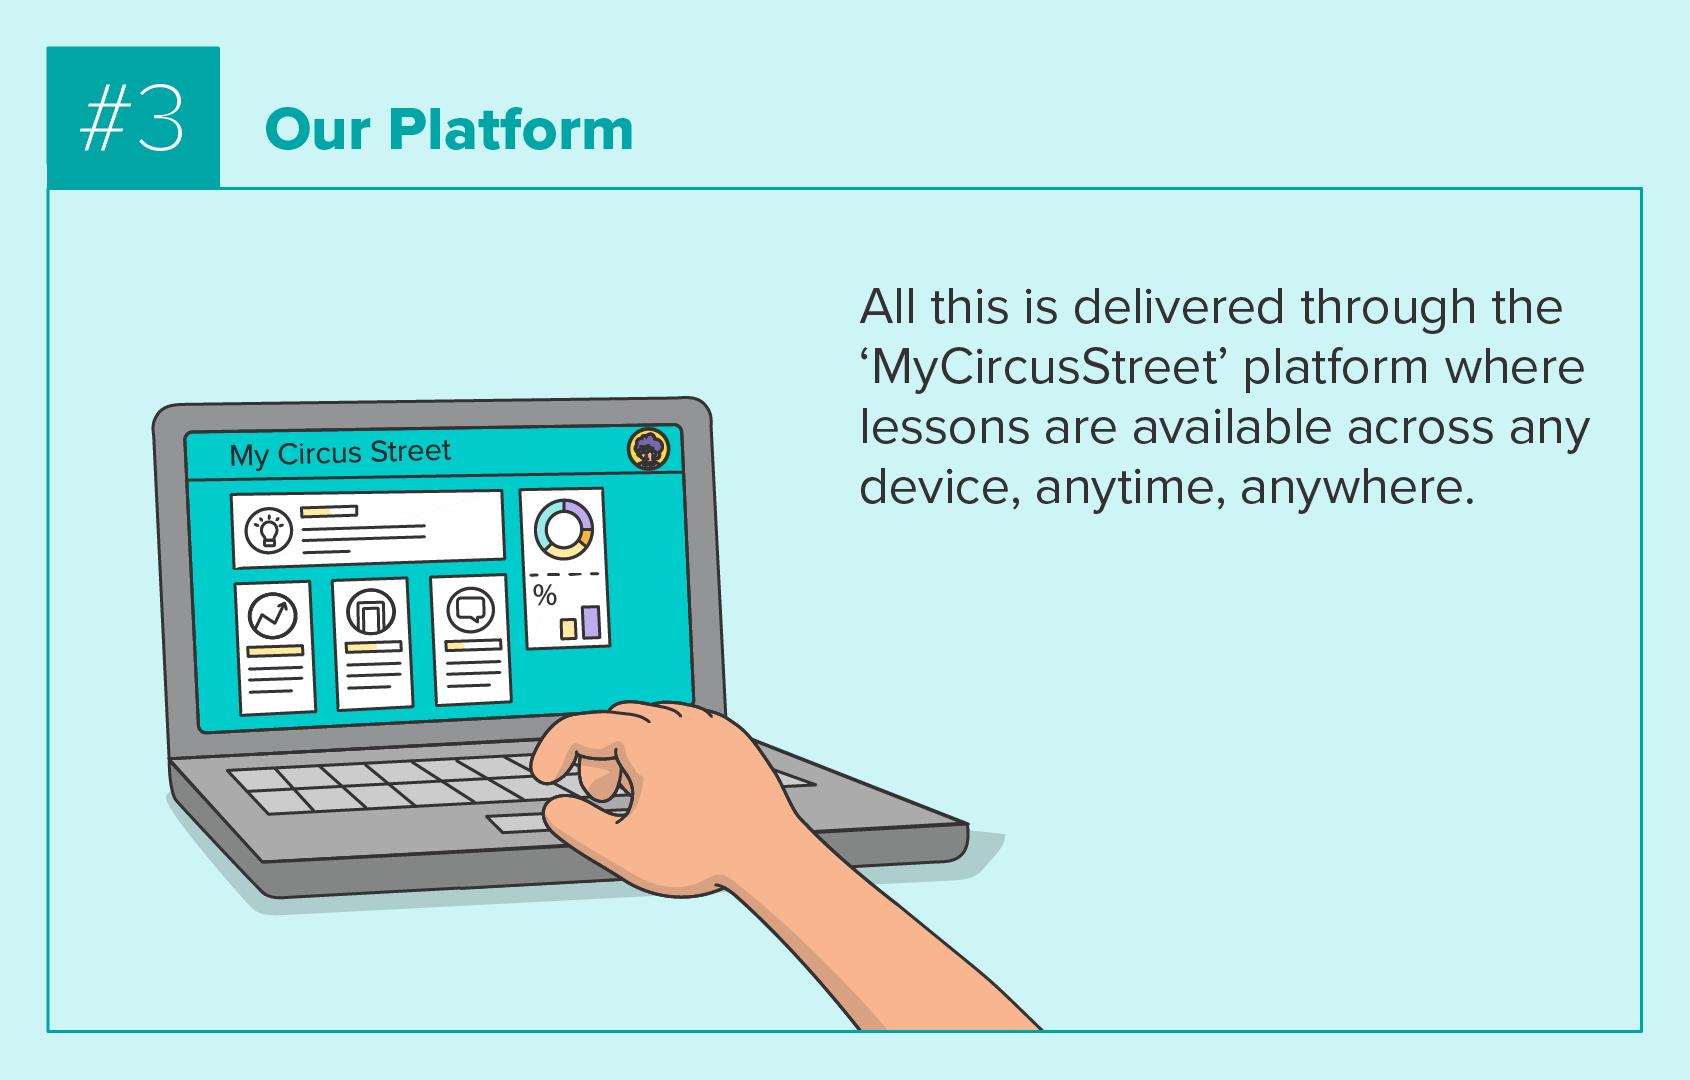 My Circus Street Platform